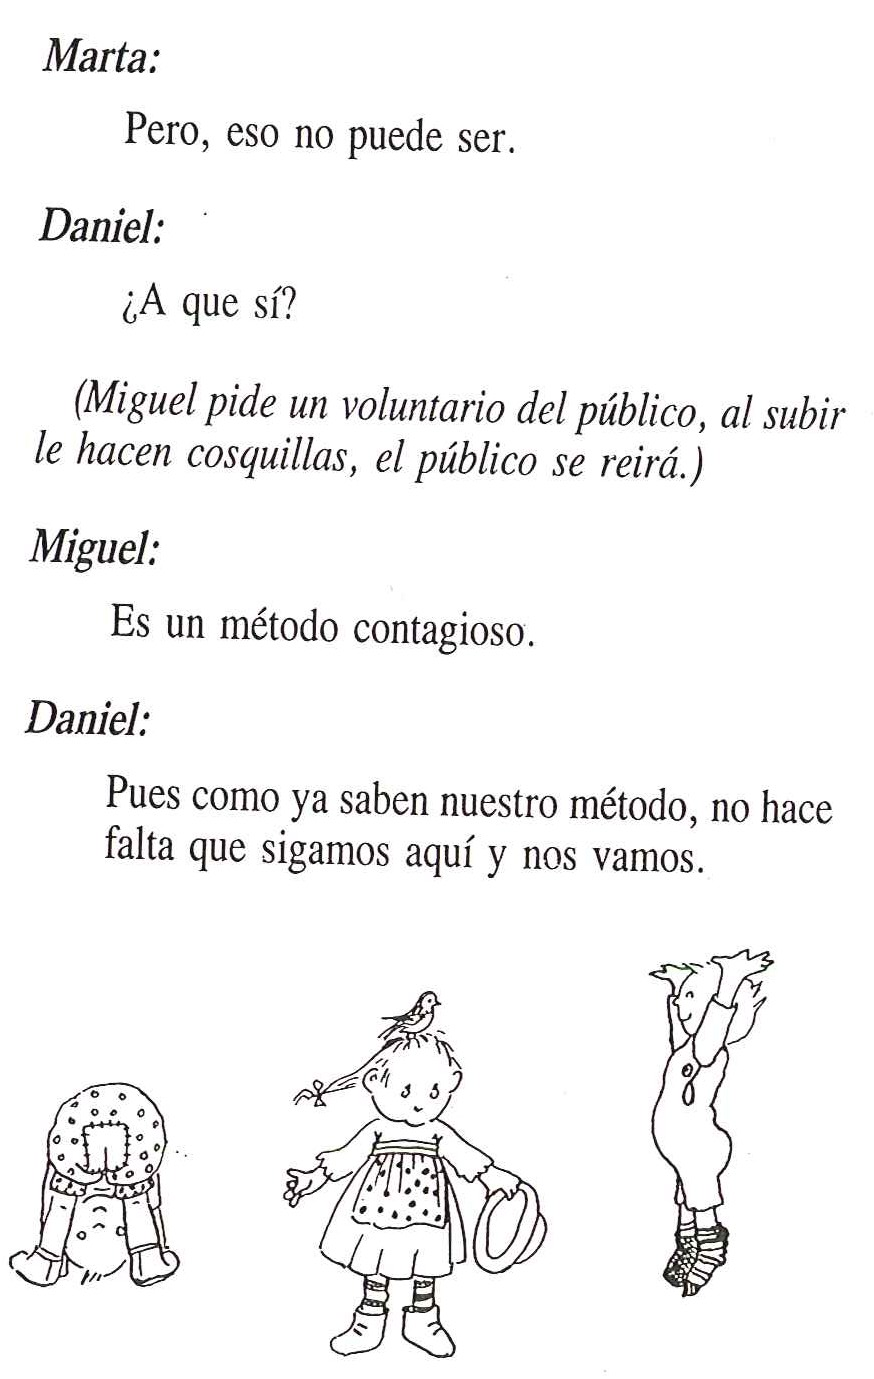 Guión del Circo de fantasía | Ramiro Pinto